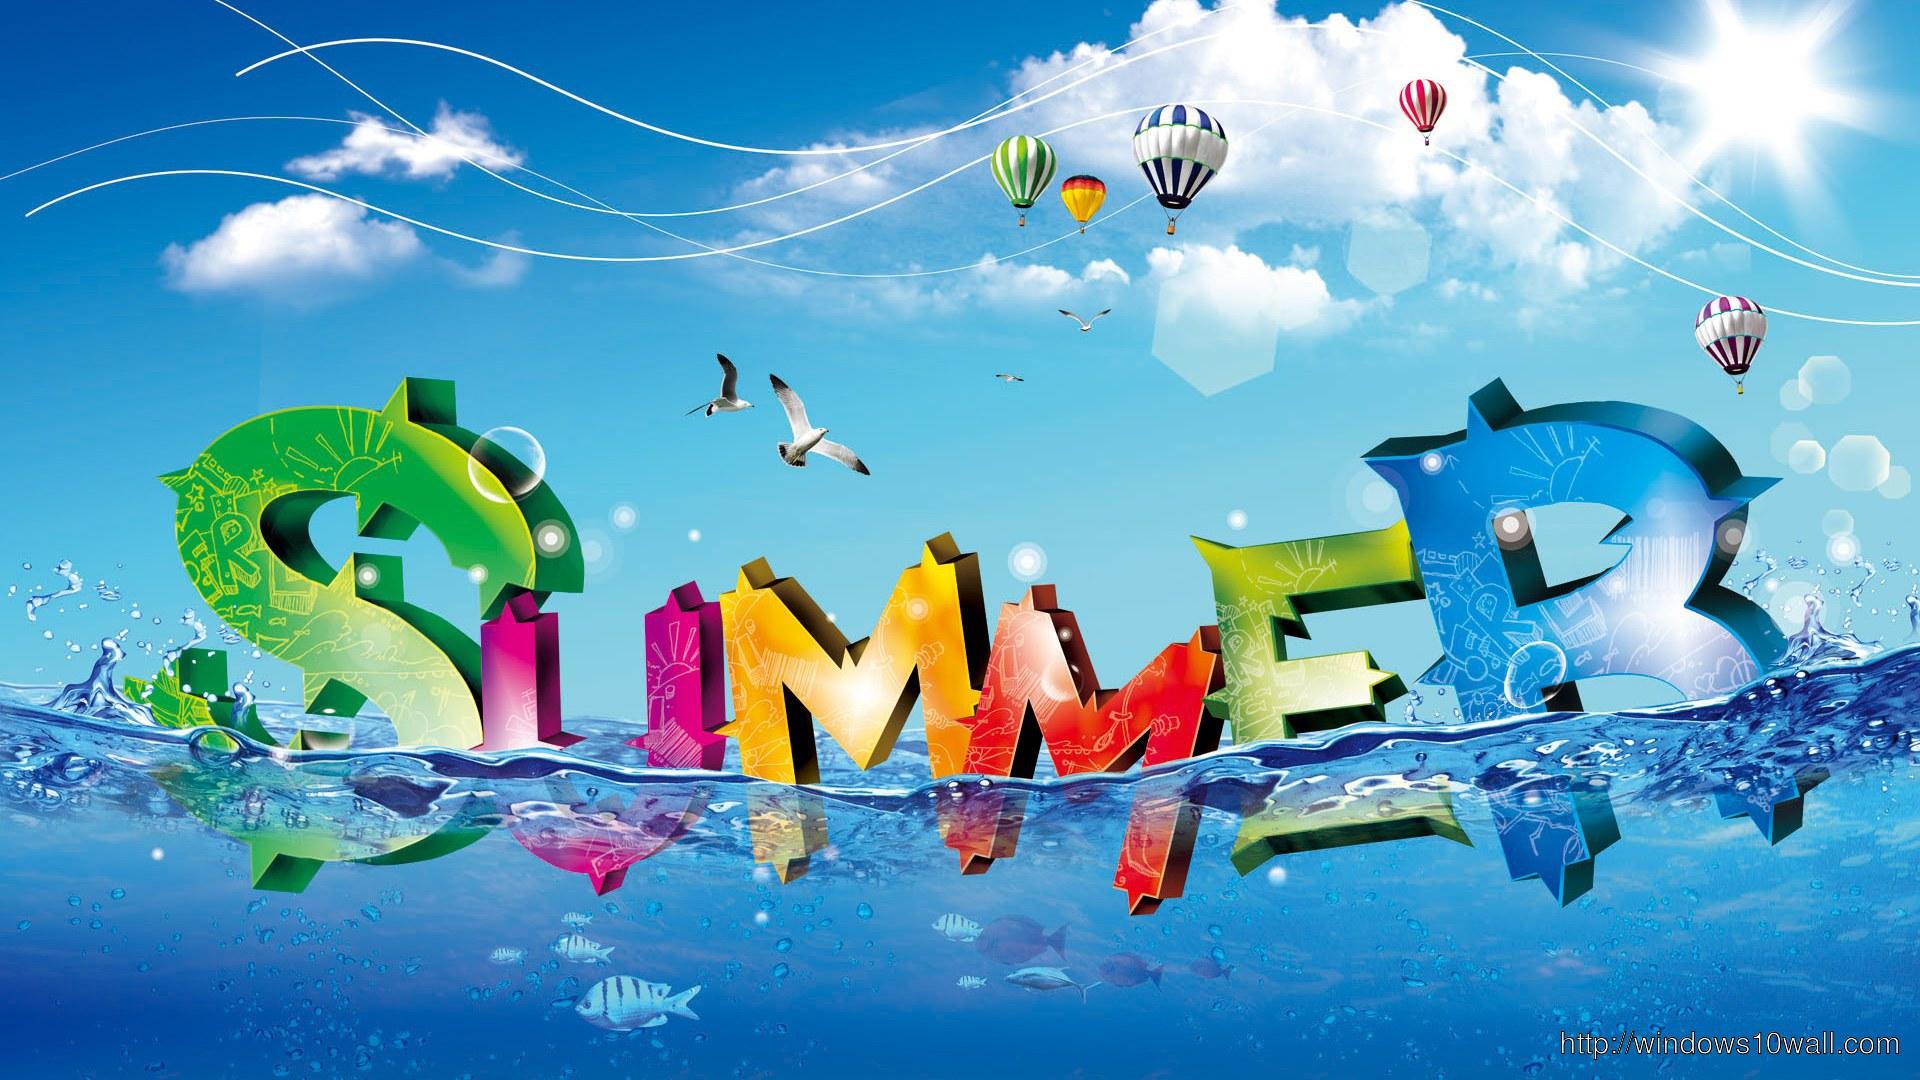 Creative Summer Background Wallpaper